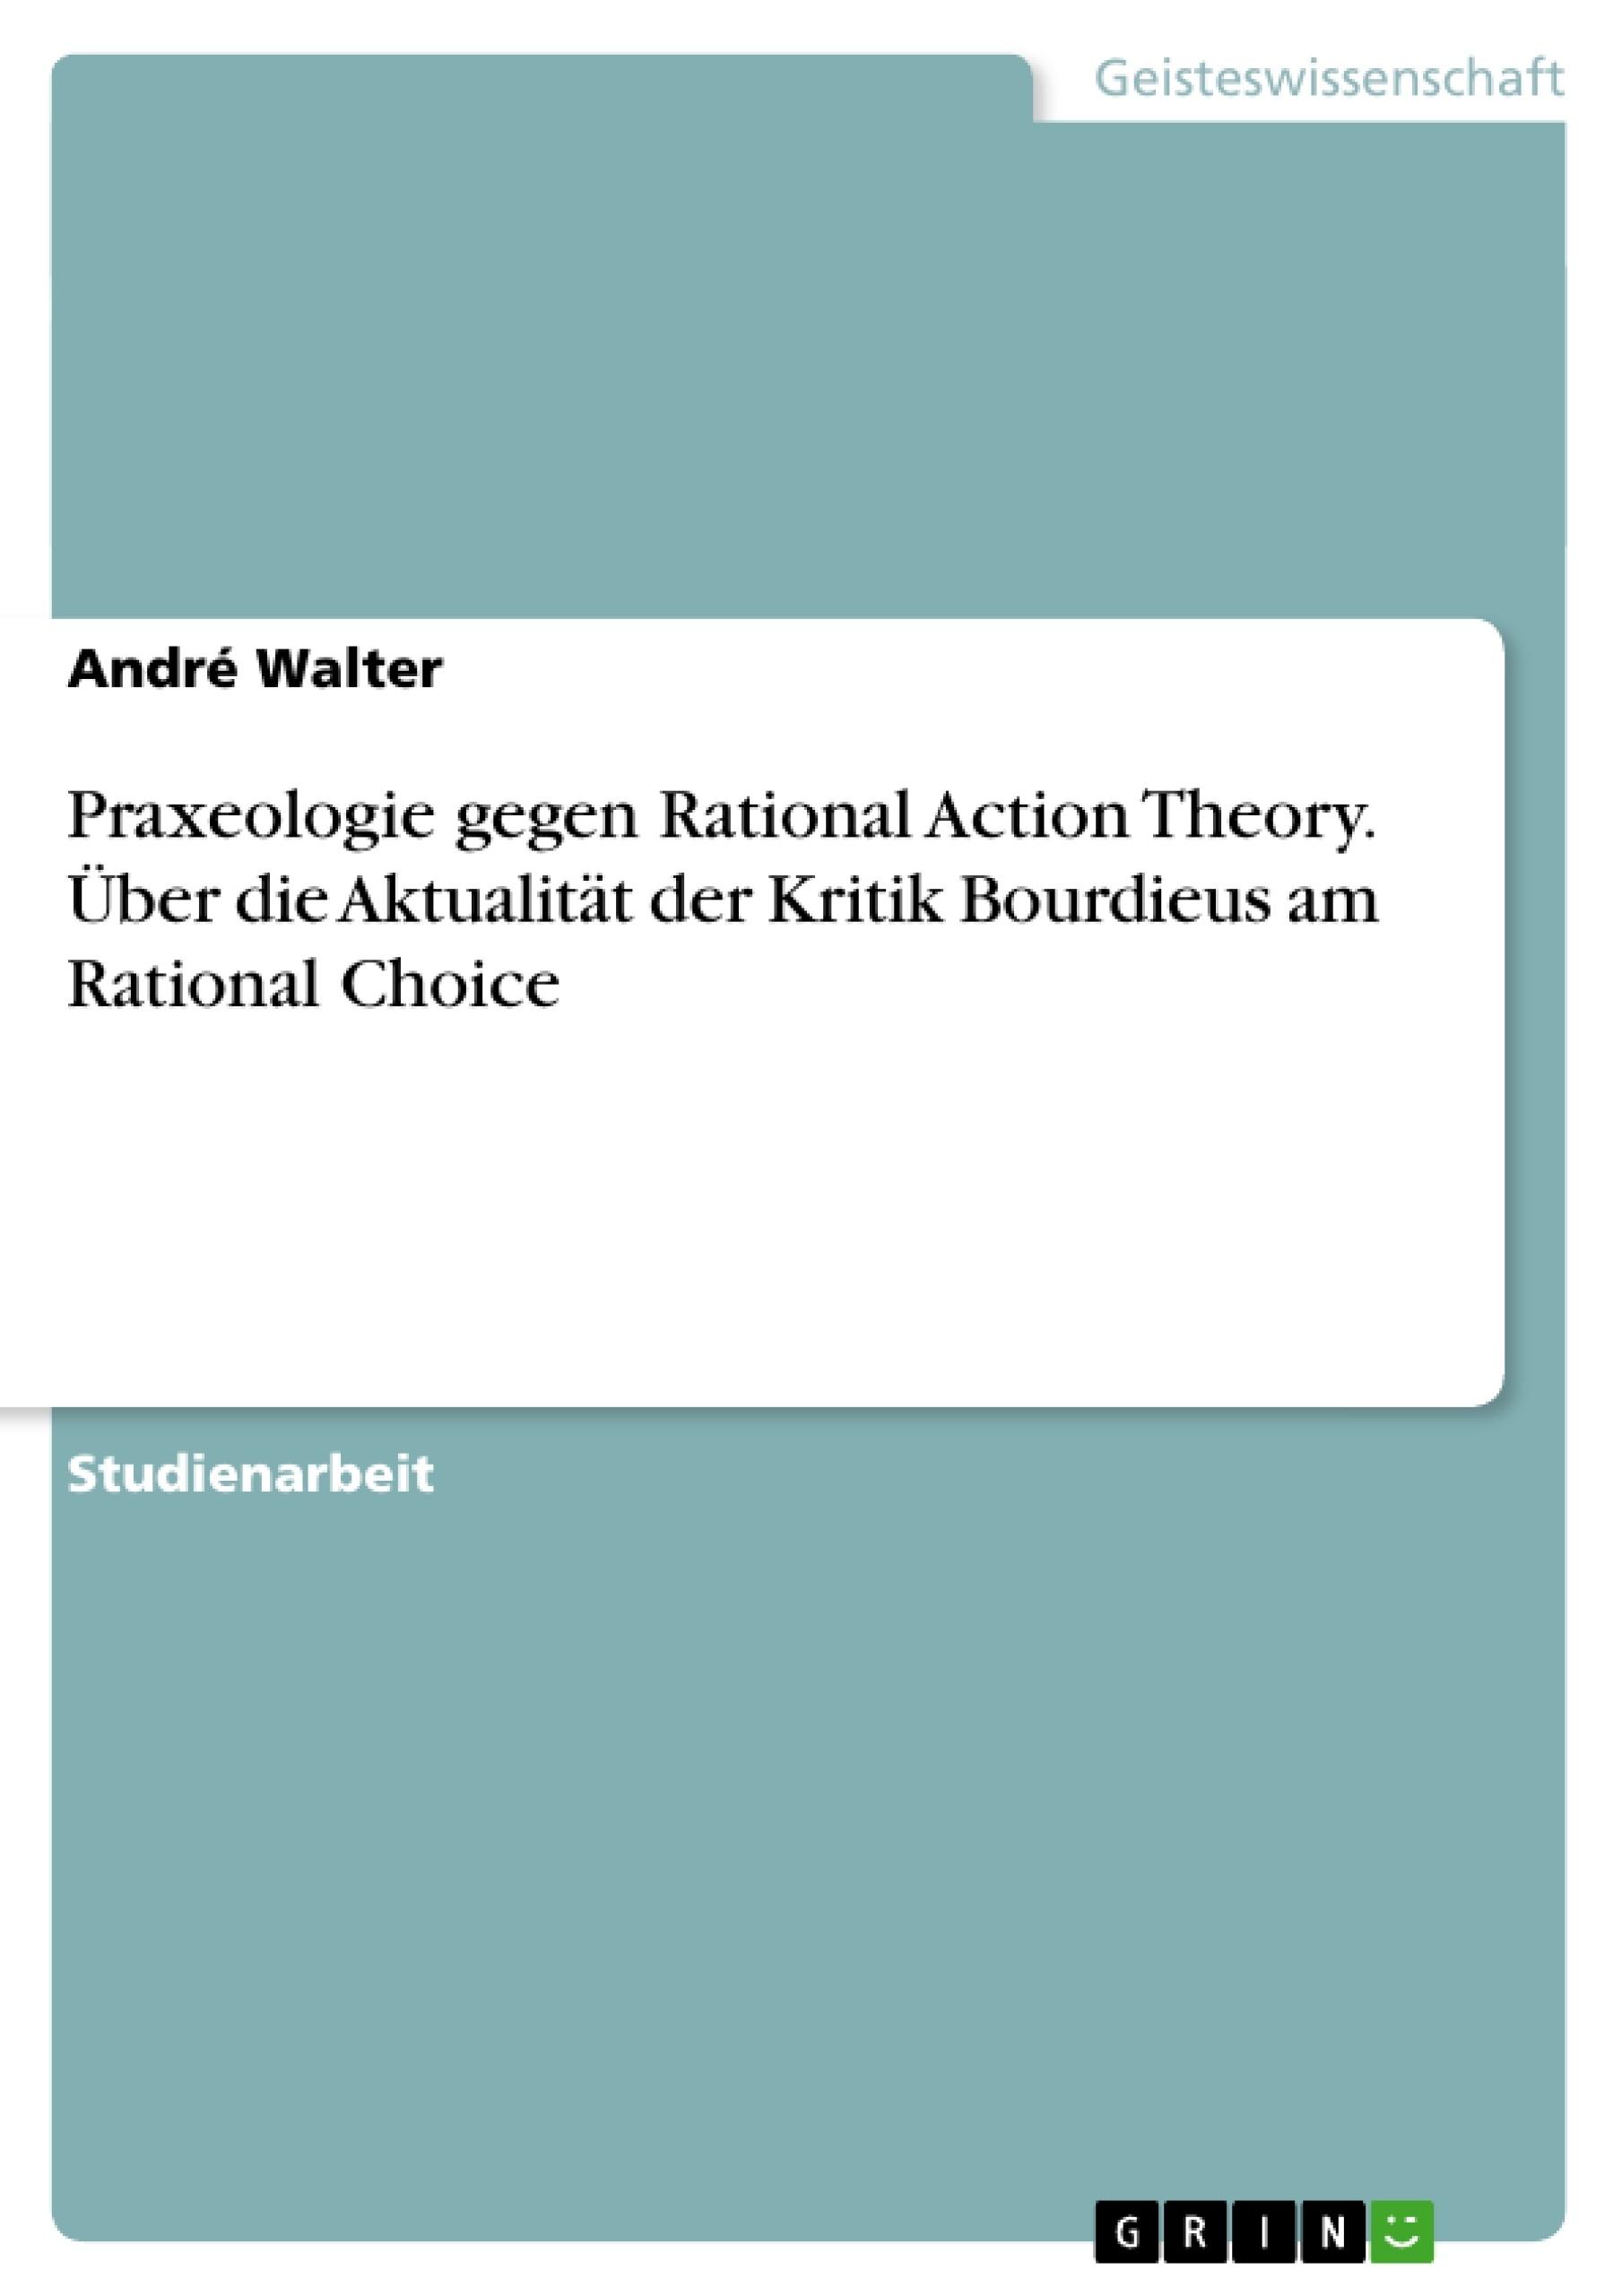 Titel: Praxeologie gegen Rational Action Theory. Über die Aktualität der Kritik Bourdieus am Rational Choice